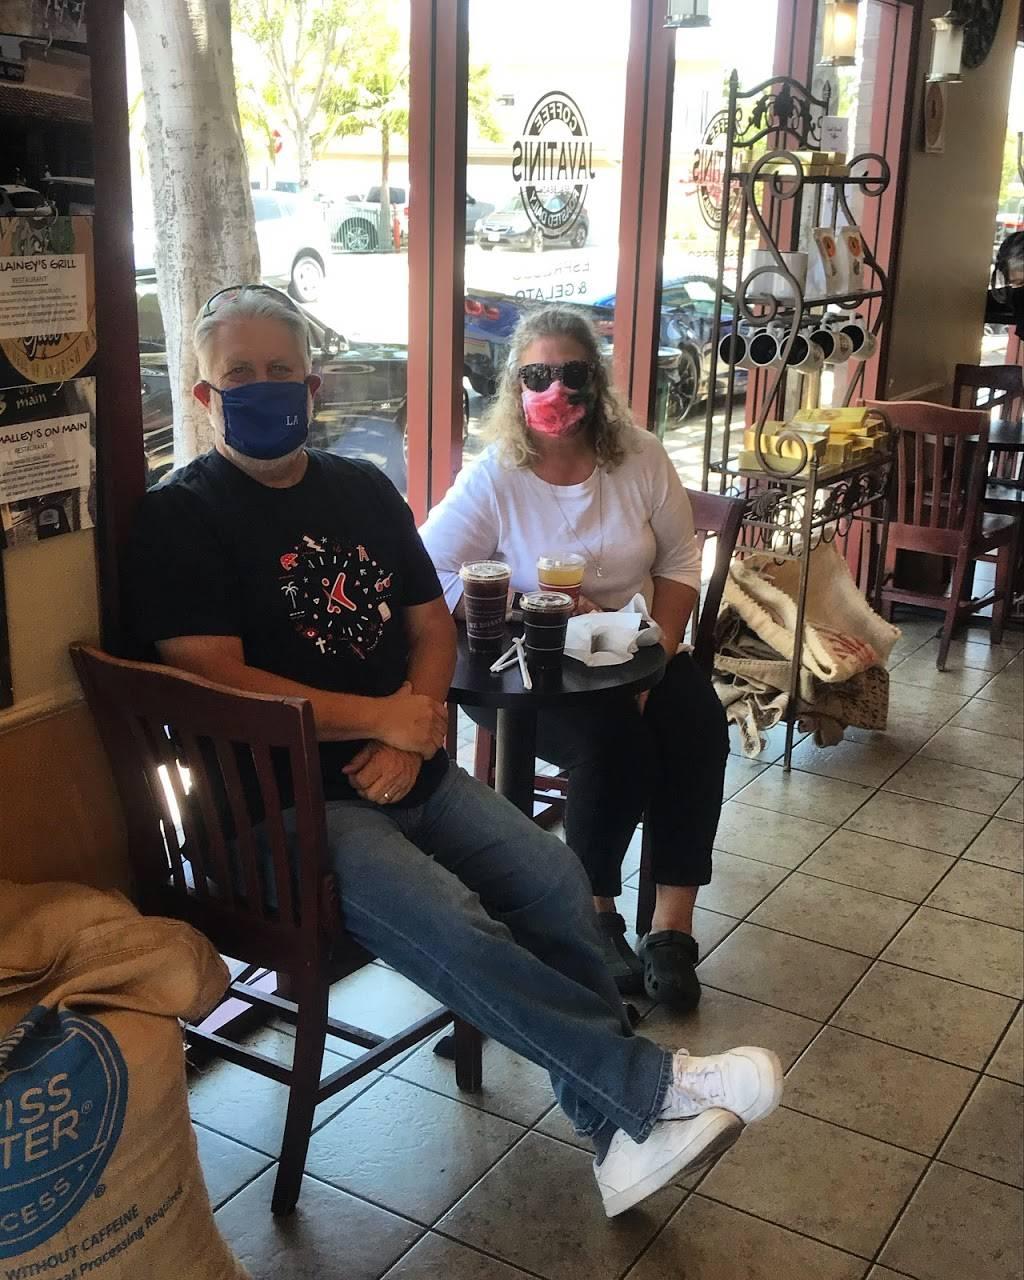 Javatinis Espresso & Gelato - cafe  | Photo 9 of 9 | Address: 148 Main St, Seal Beach, CA 90740, USA | Phone: (562) 626-8202